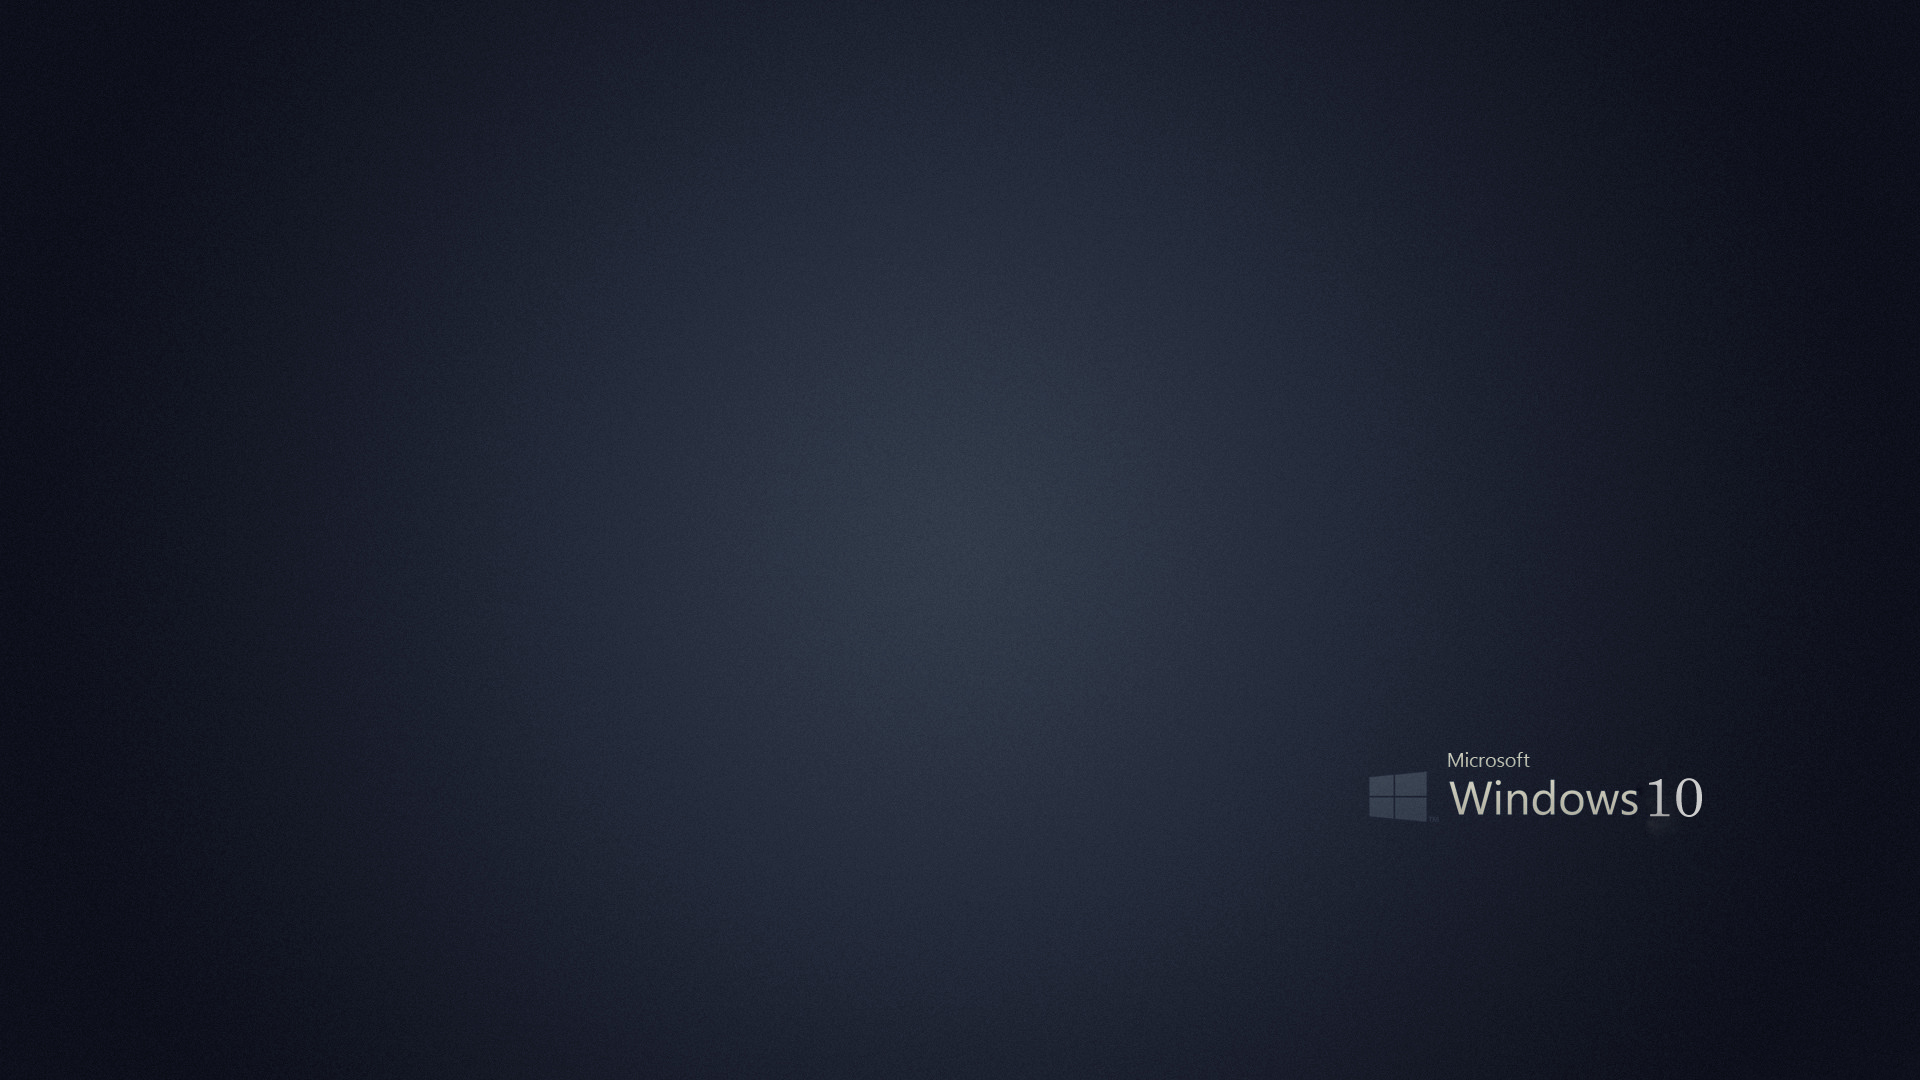 Windows 10 Wallpaper Desktop Background - WallpaperSafari